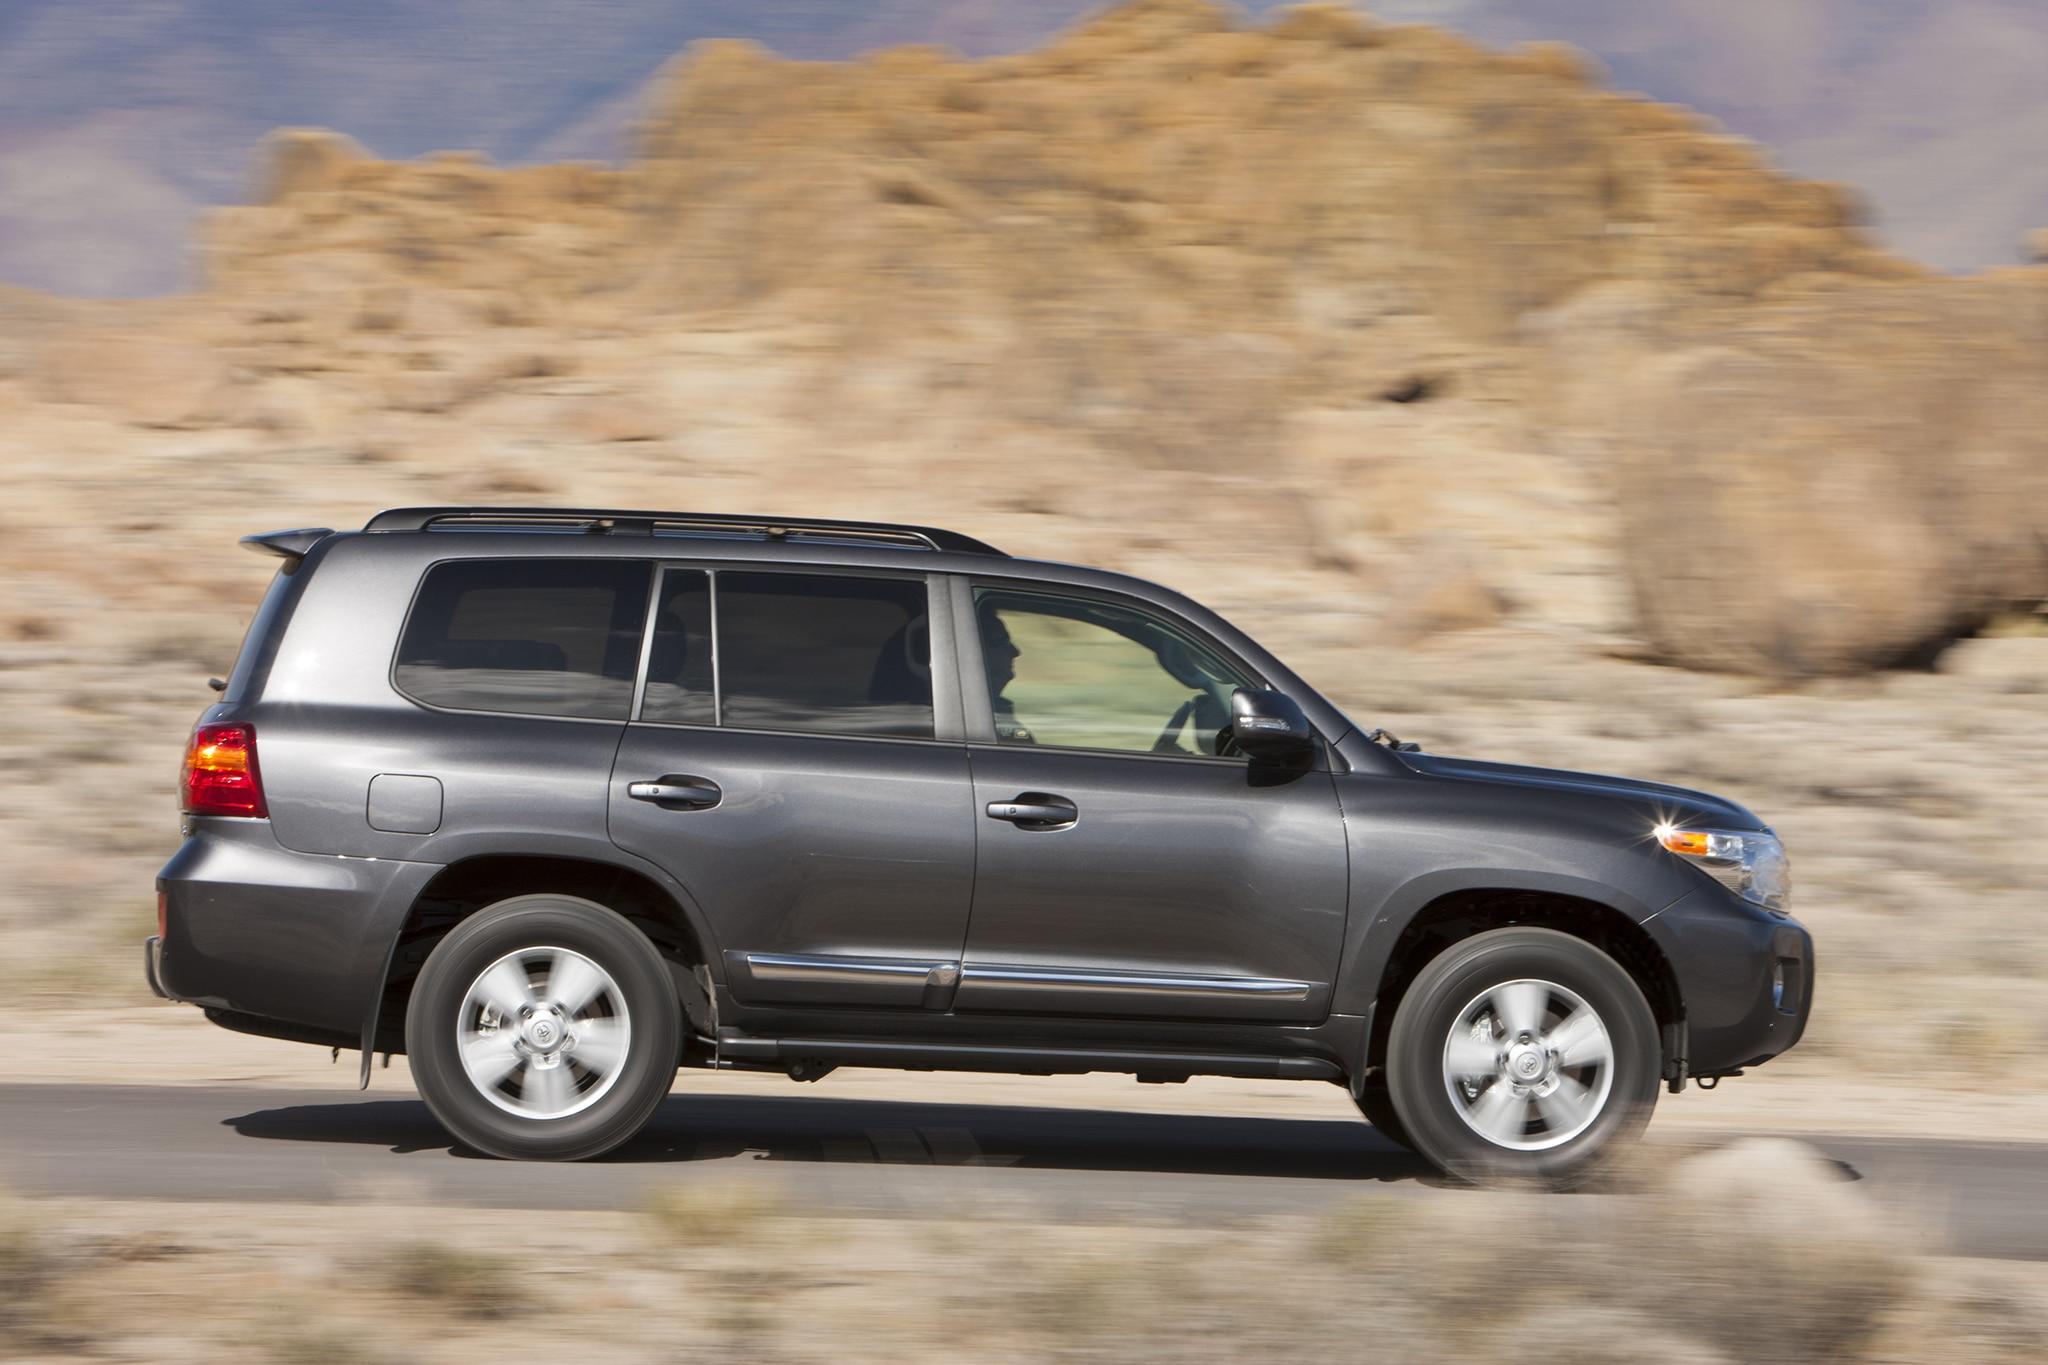 2013 Toyota Land Cruiser First Look